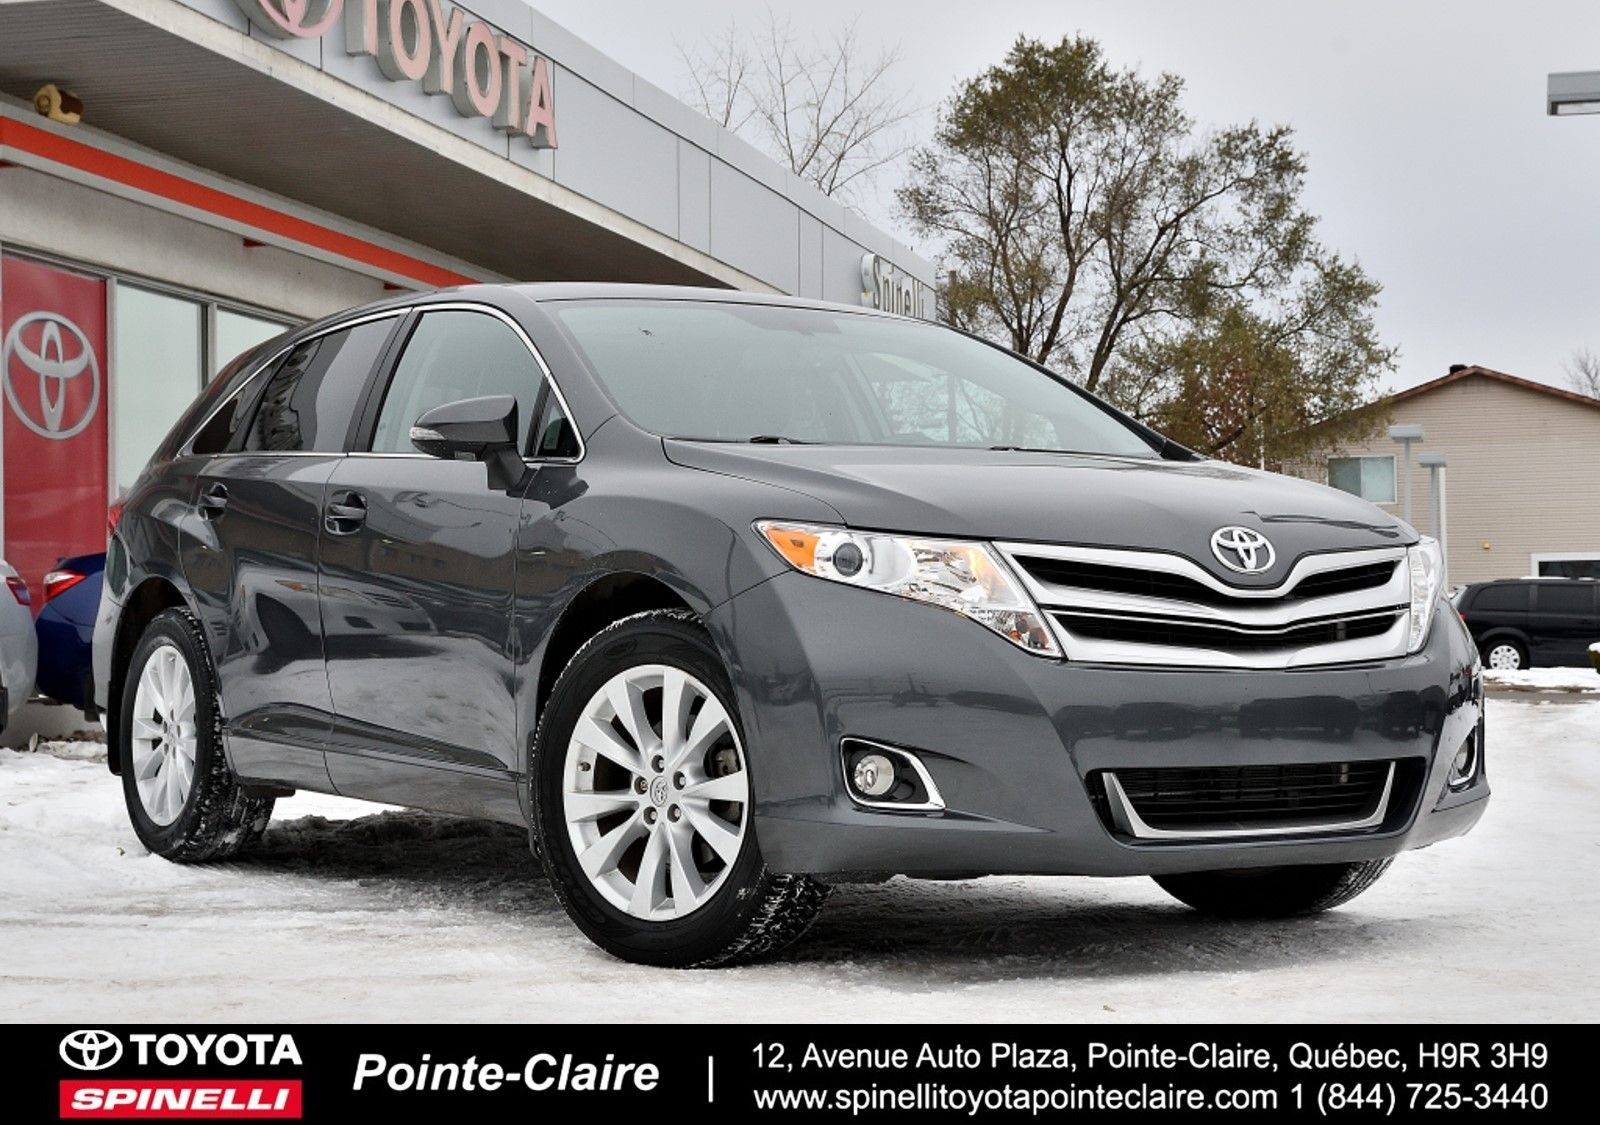 Toyota Venza 2016 >> 2016 Toyota Venza Reserve Xle Awd Upgrade Pkg